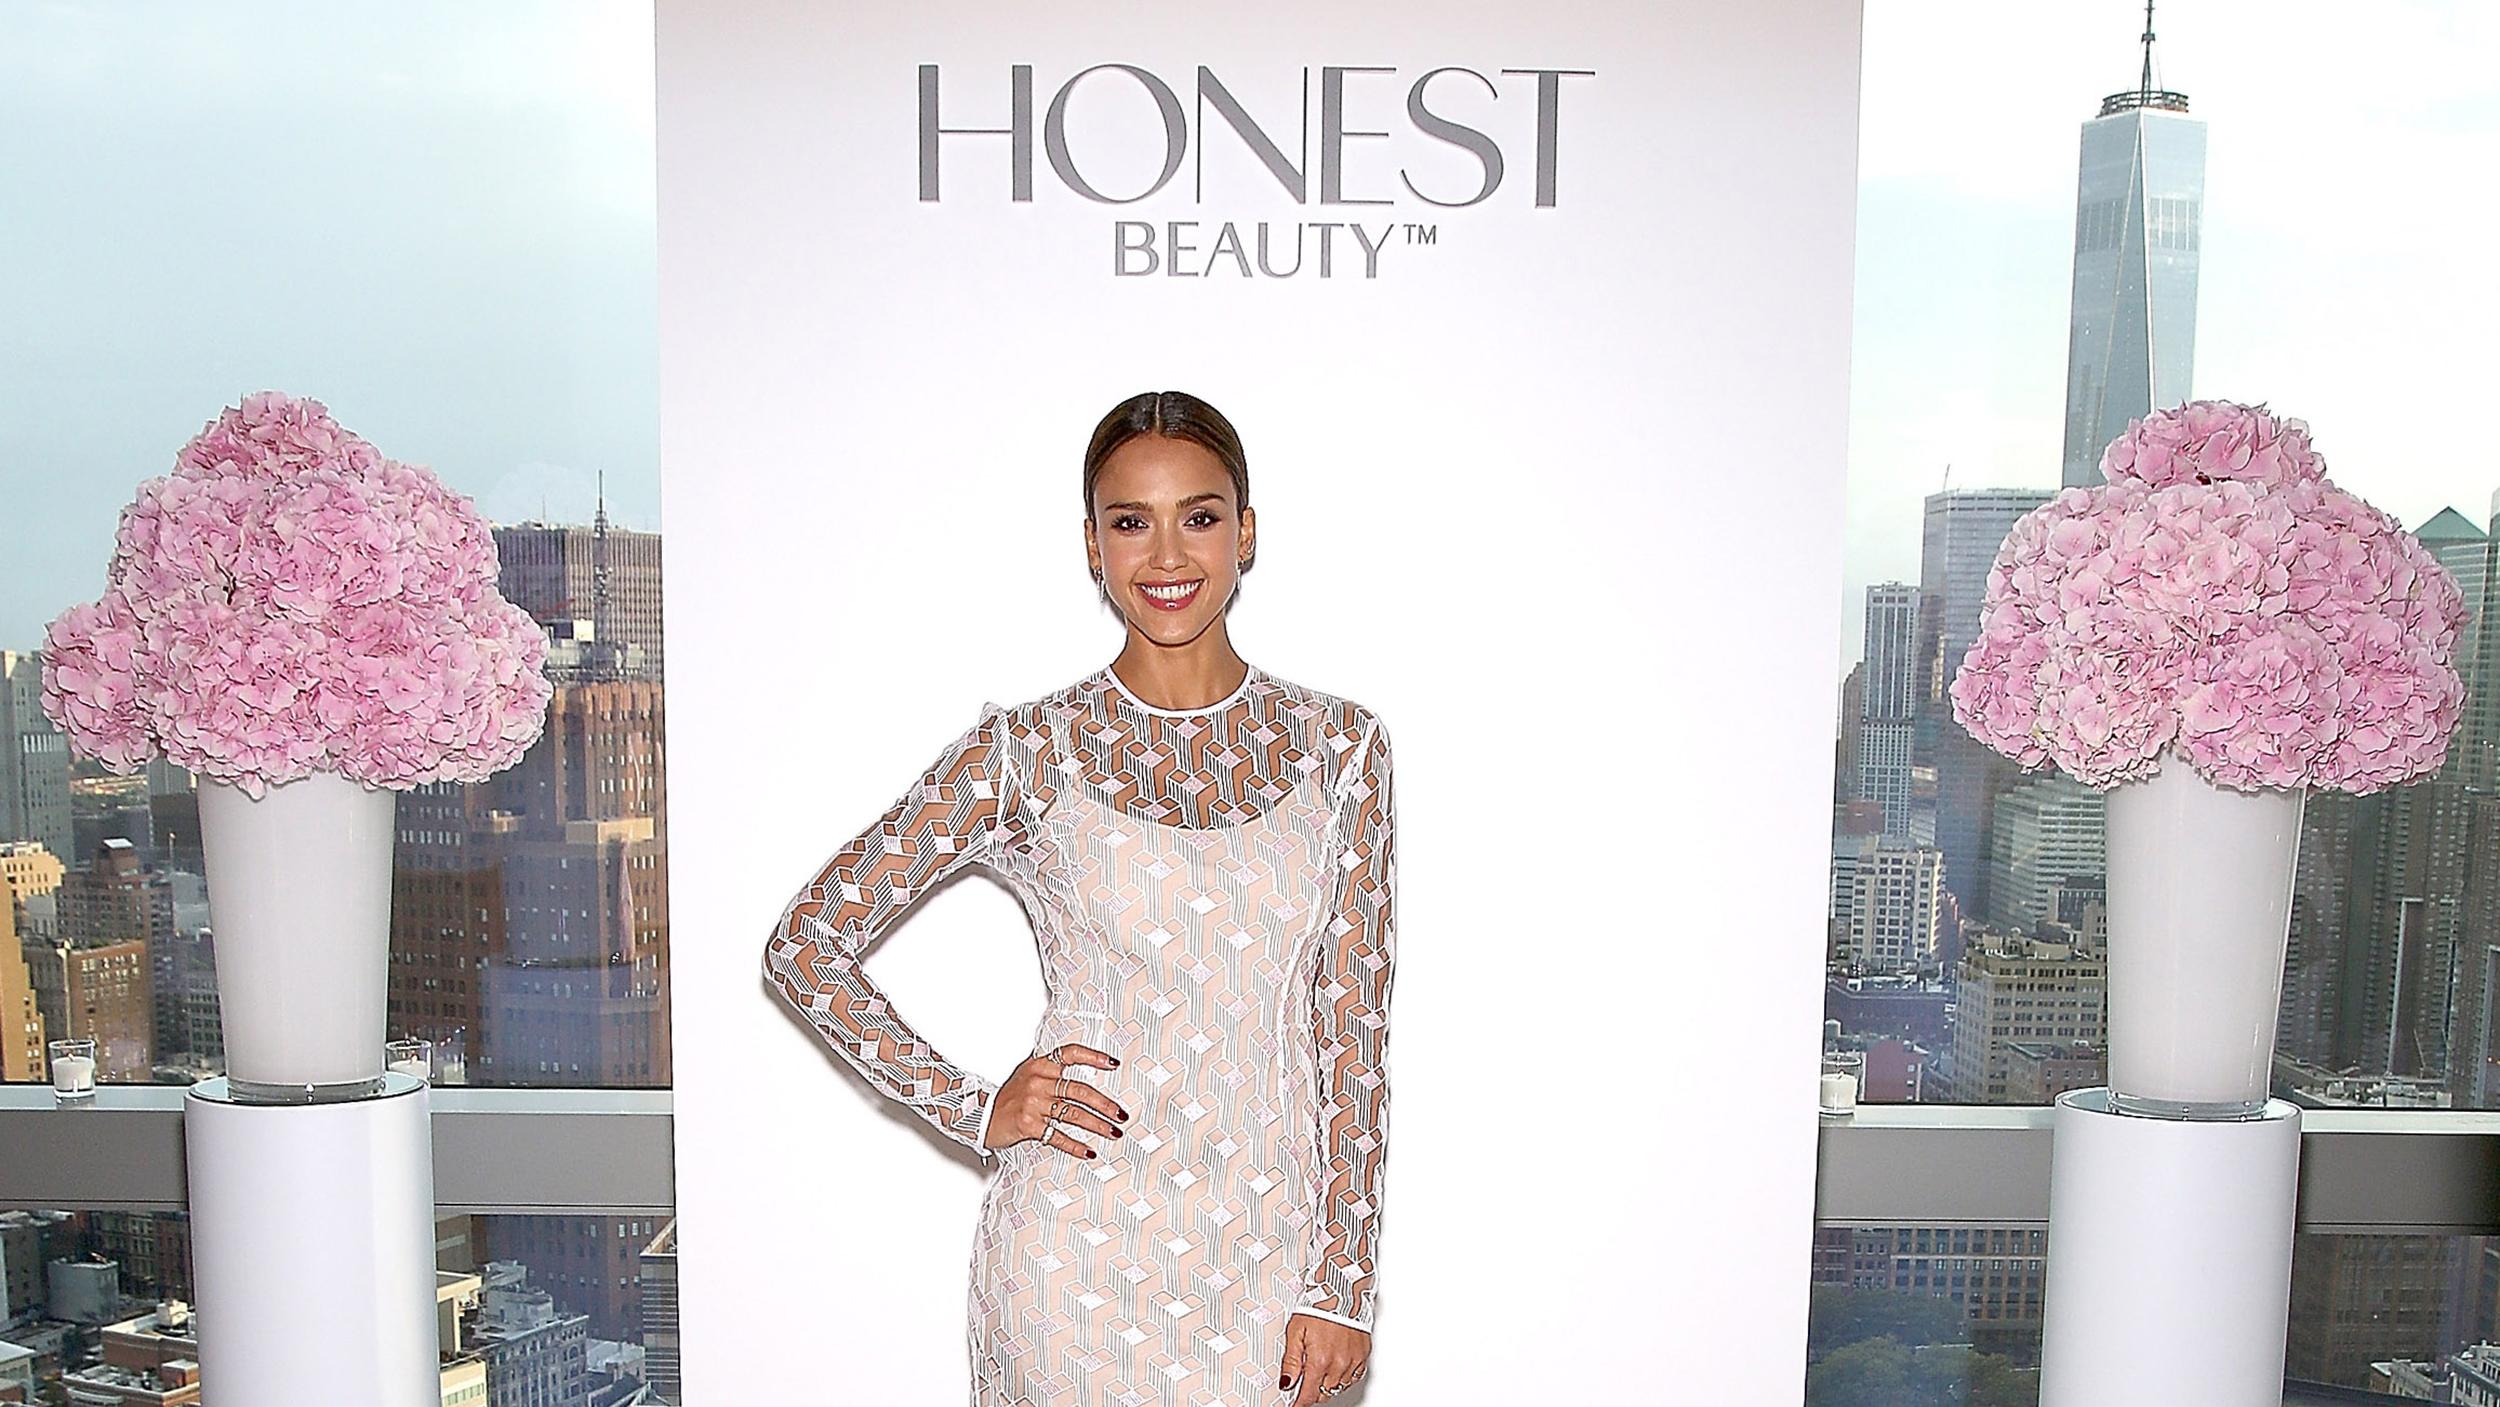 Honest-beauty